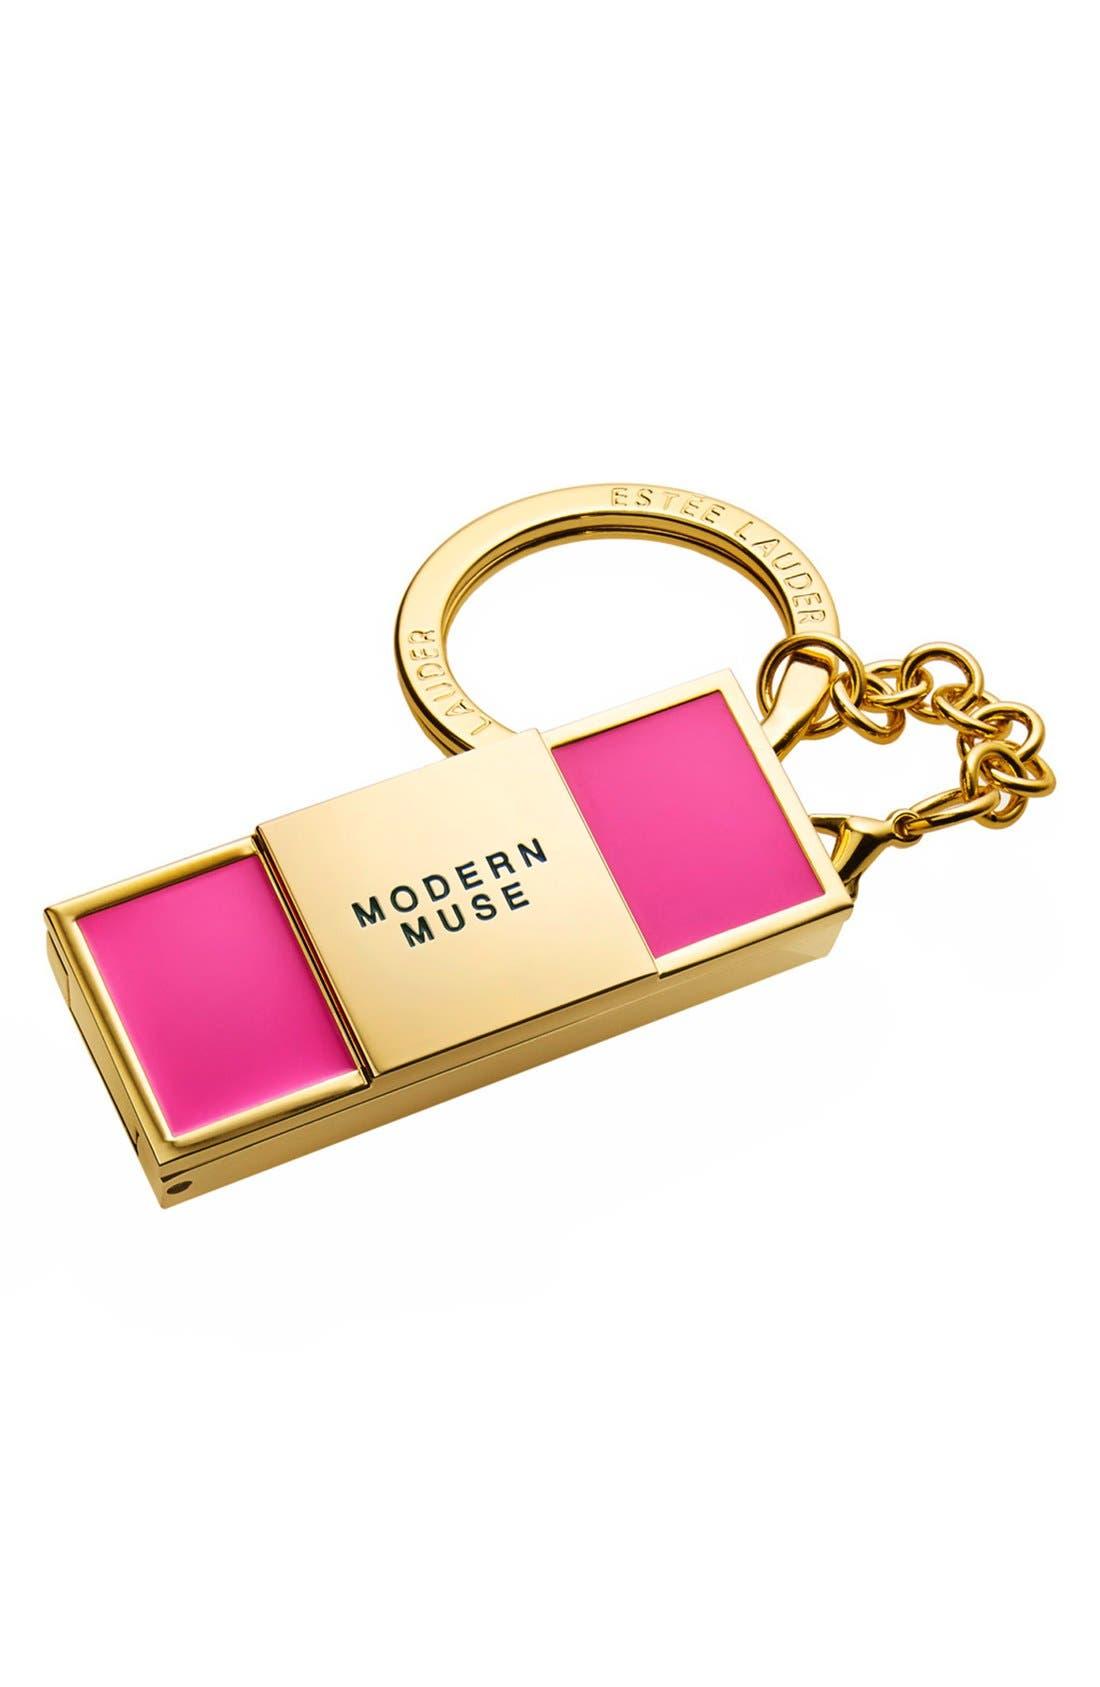 ESTÉE LAUDER, 'Evelyn Lauder & Elizabeth Hurley Dream Pink -Modern Muse' Solid Perfume Keychain, Main thumbnail 1, color, 000